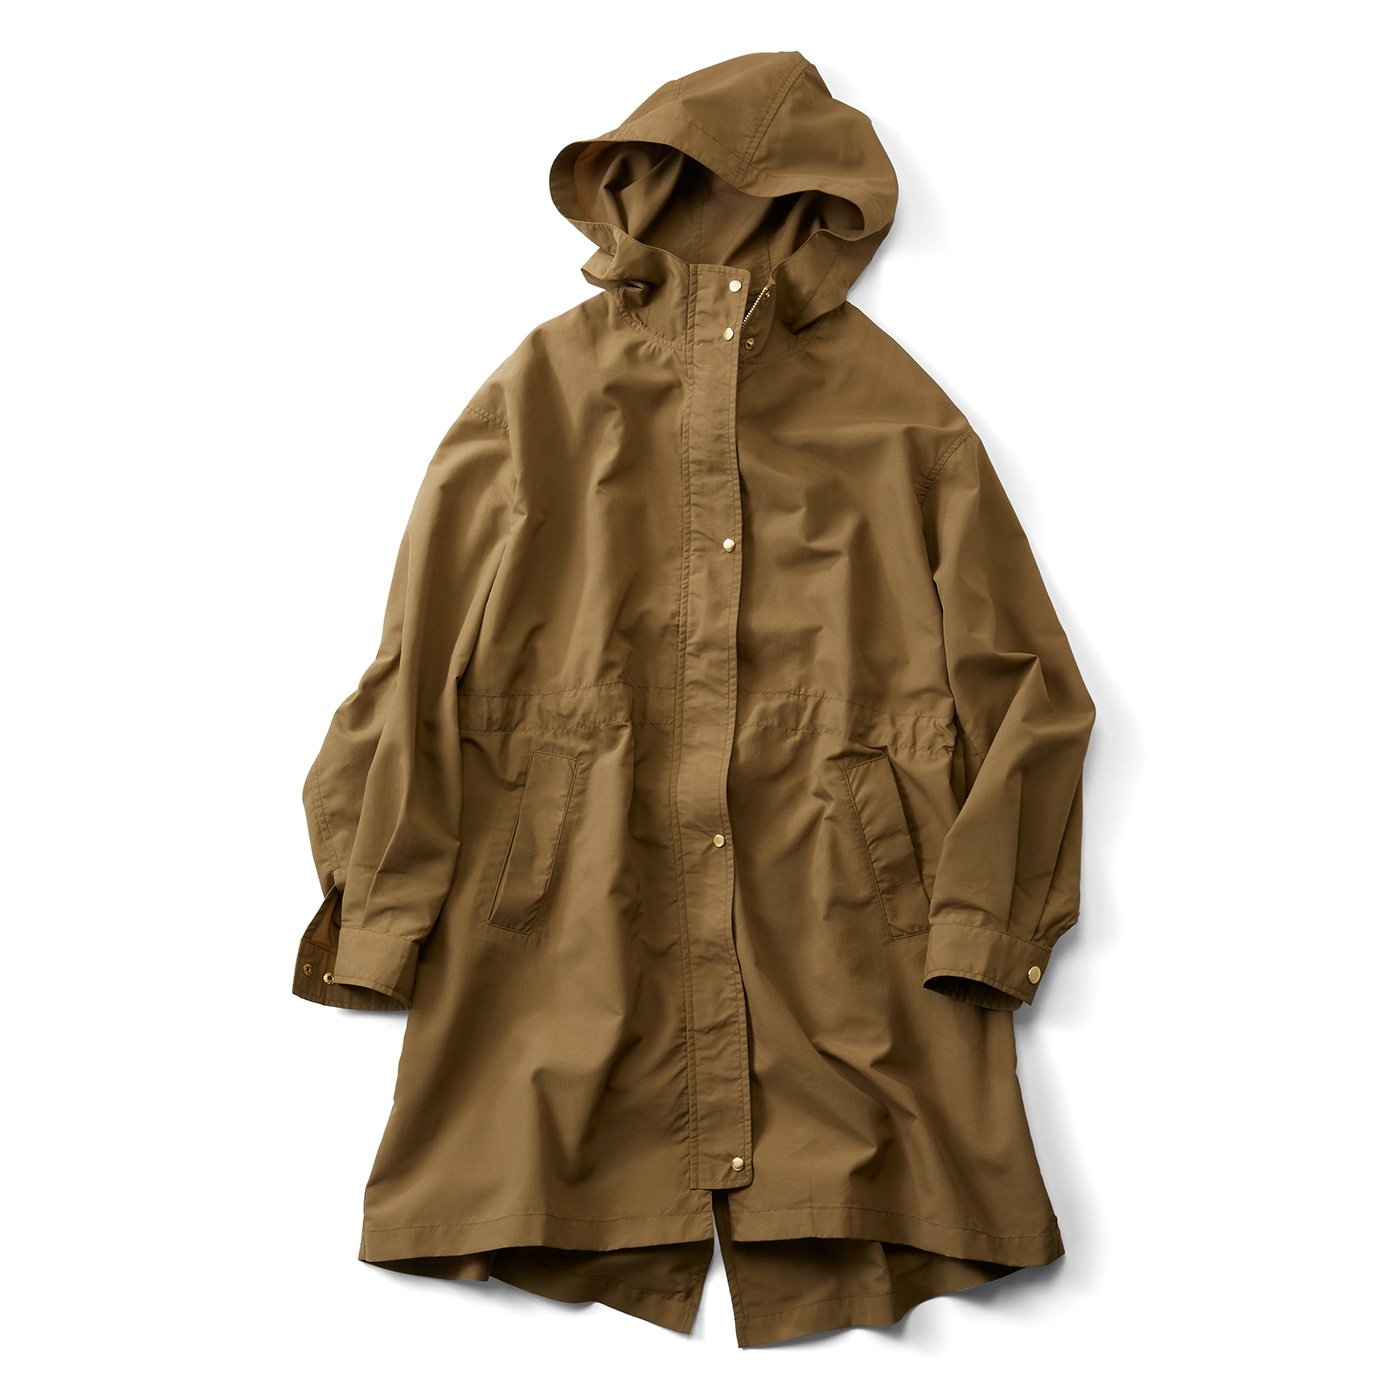 IEDIT[イディット] 花粉がつきにくくて多機能がうれしい 背負えて便利なミドル丈フーデッドコート〈ラテベージュ〉